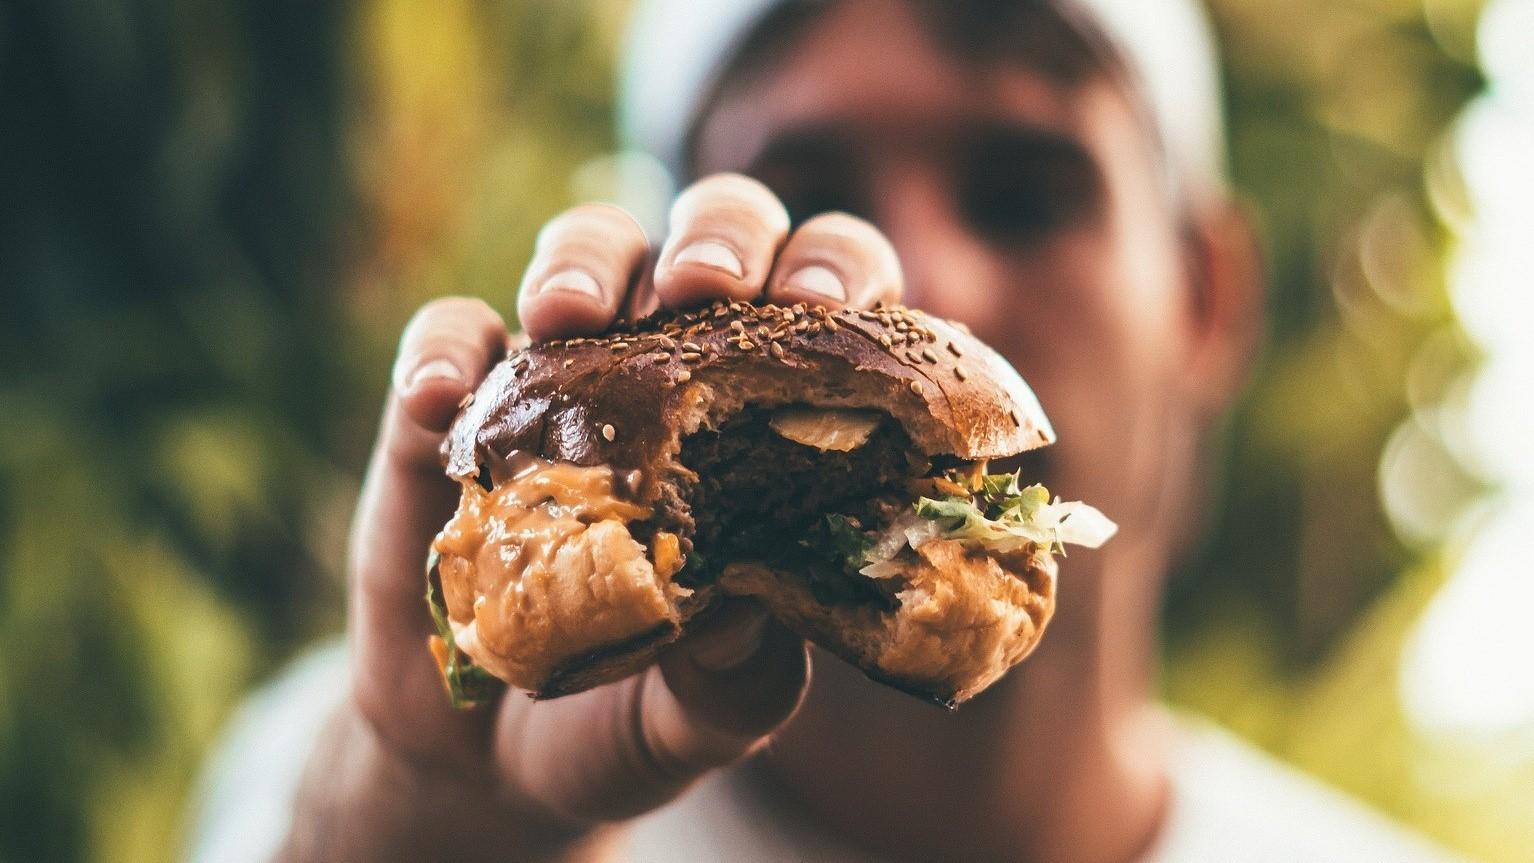 Coonass Cheese Burger - Smoky pork & mature cheddar, pickle, onion & awesome saucebutter toasted brioche bun70,- kr